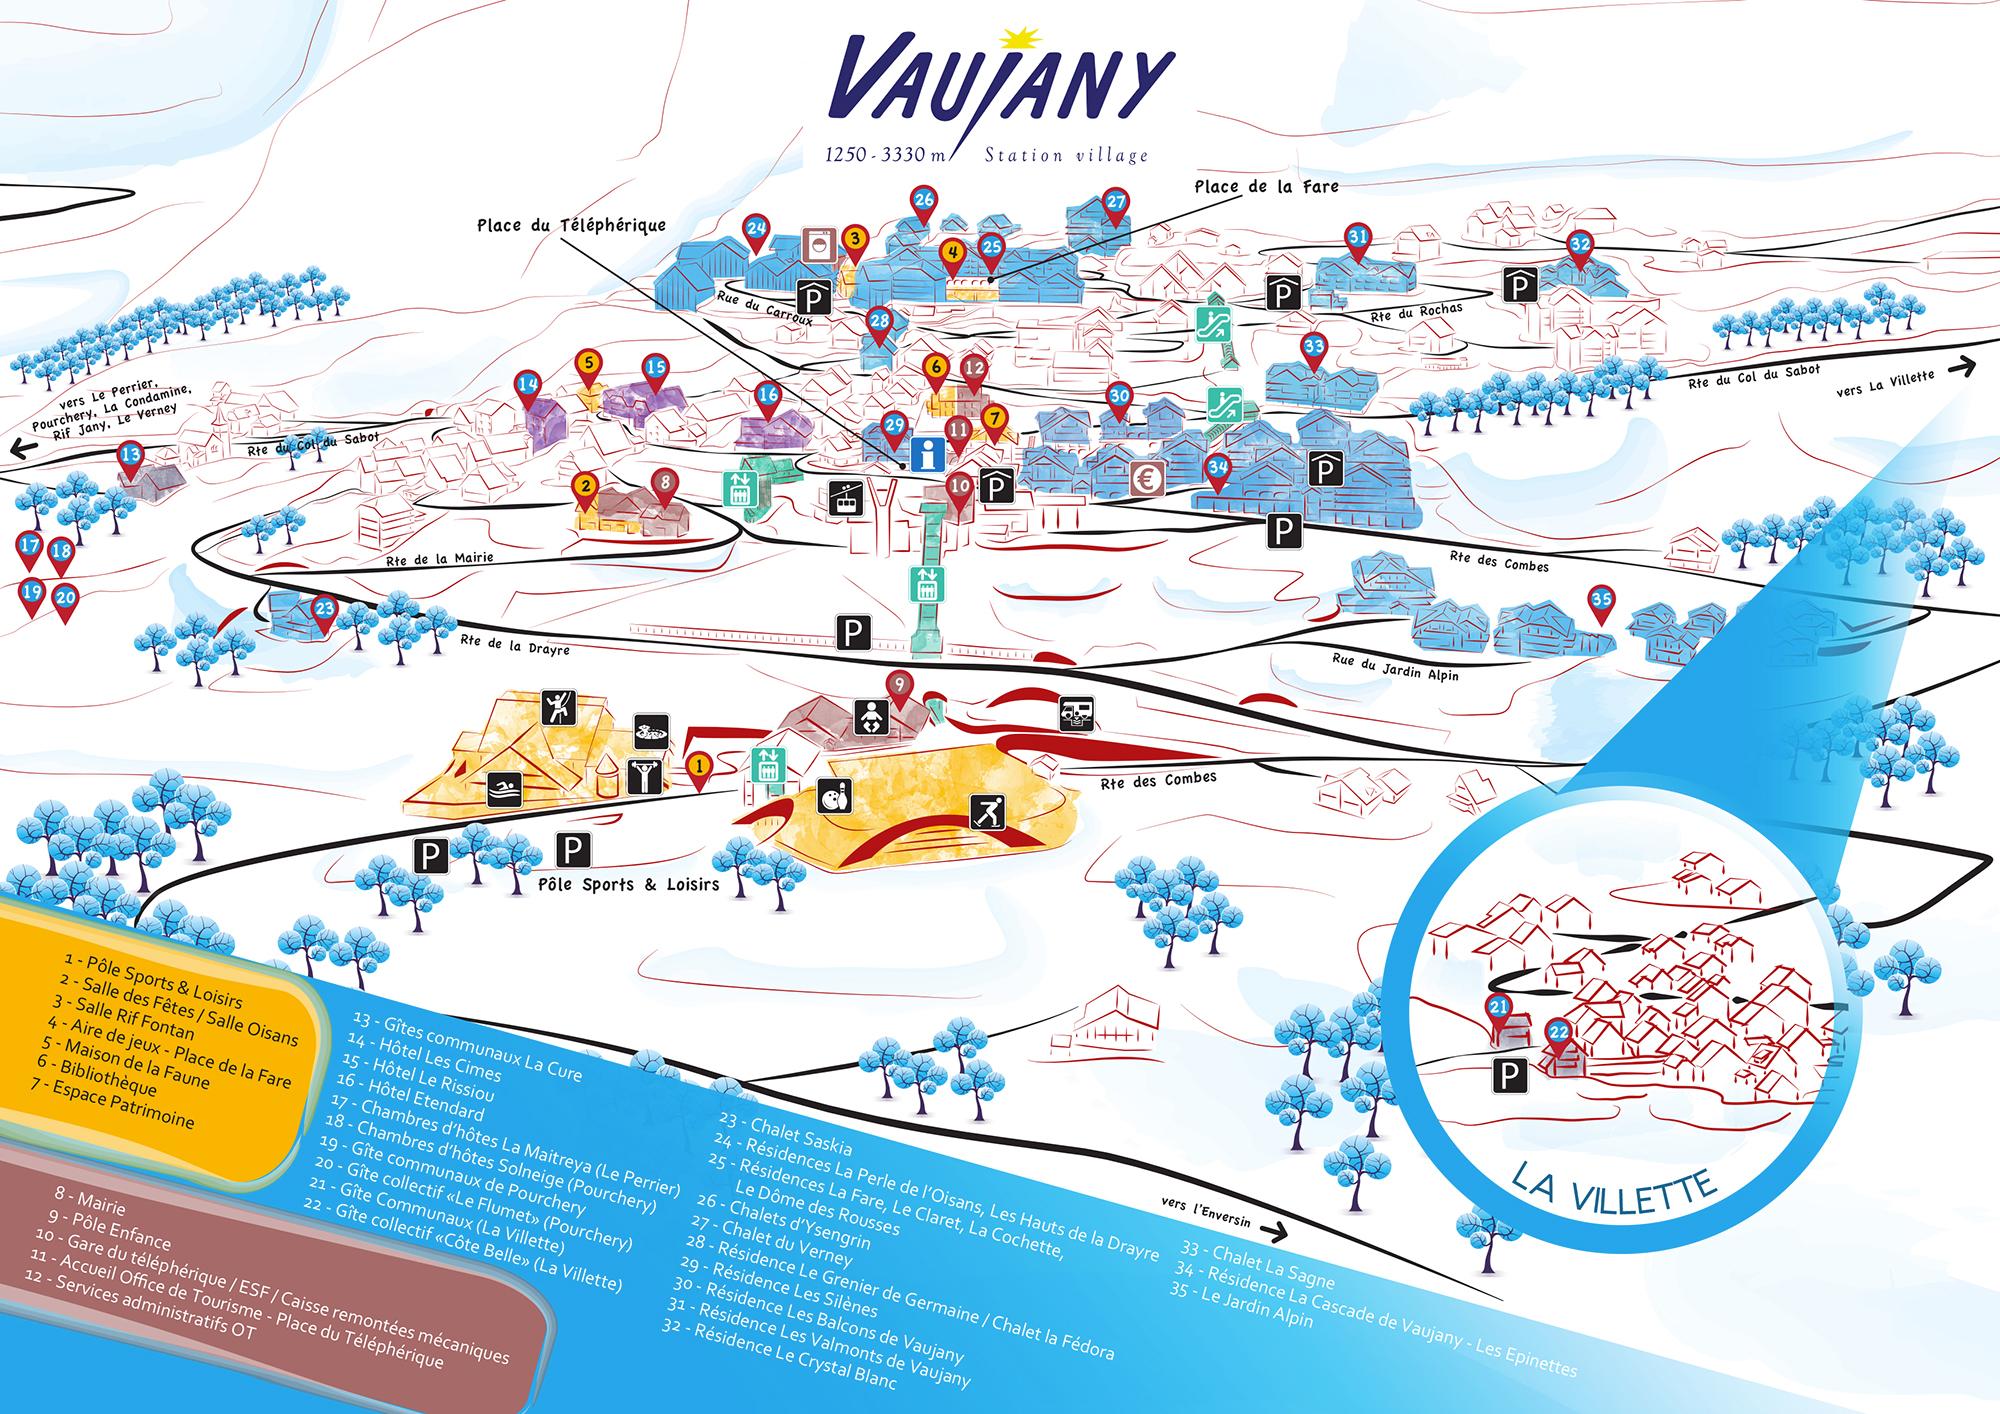 Plan d'accès Vaujany